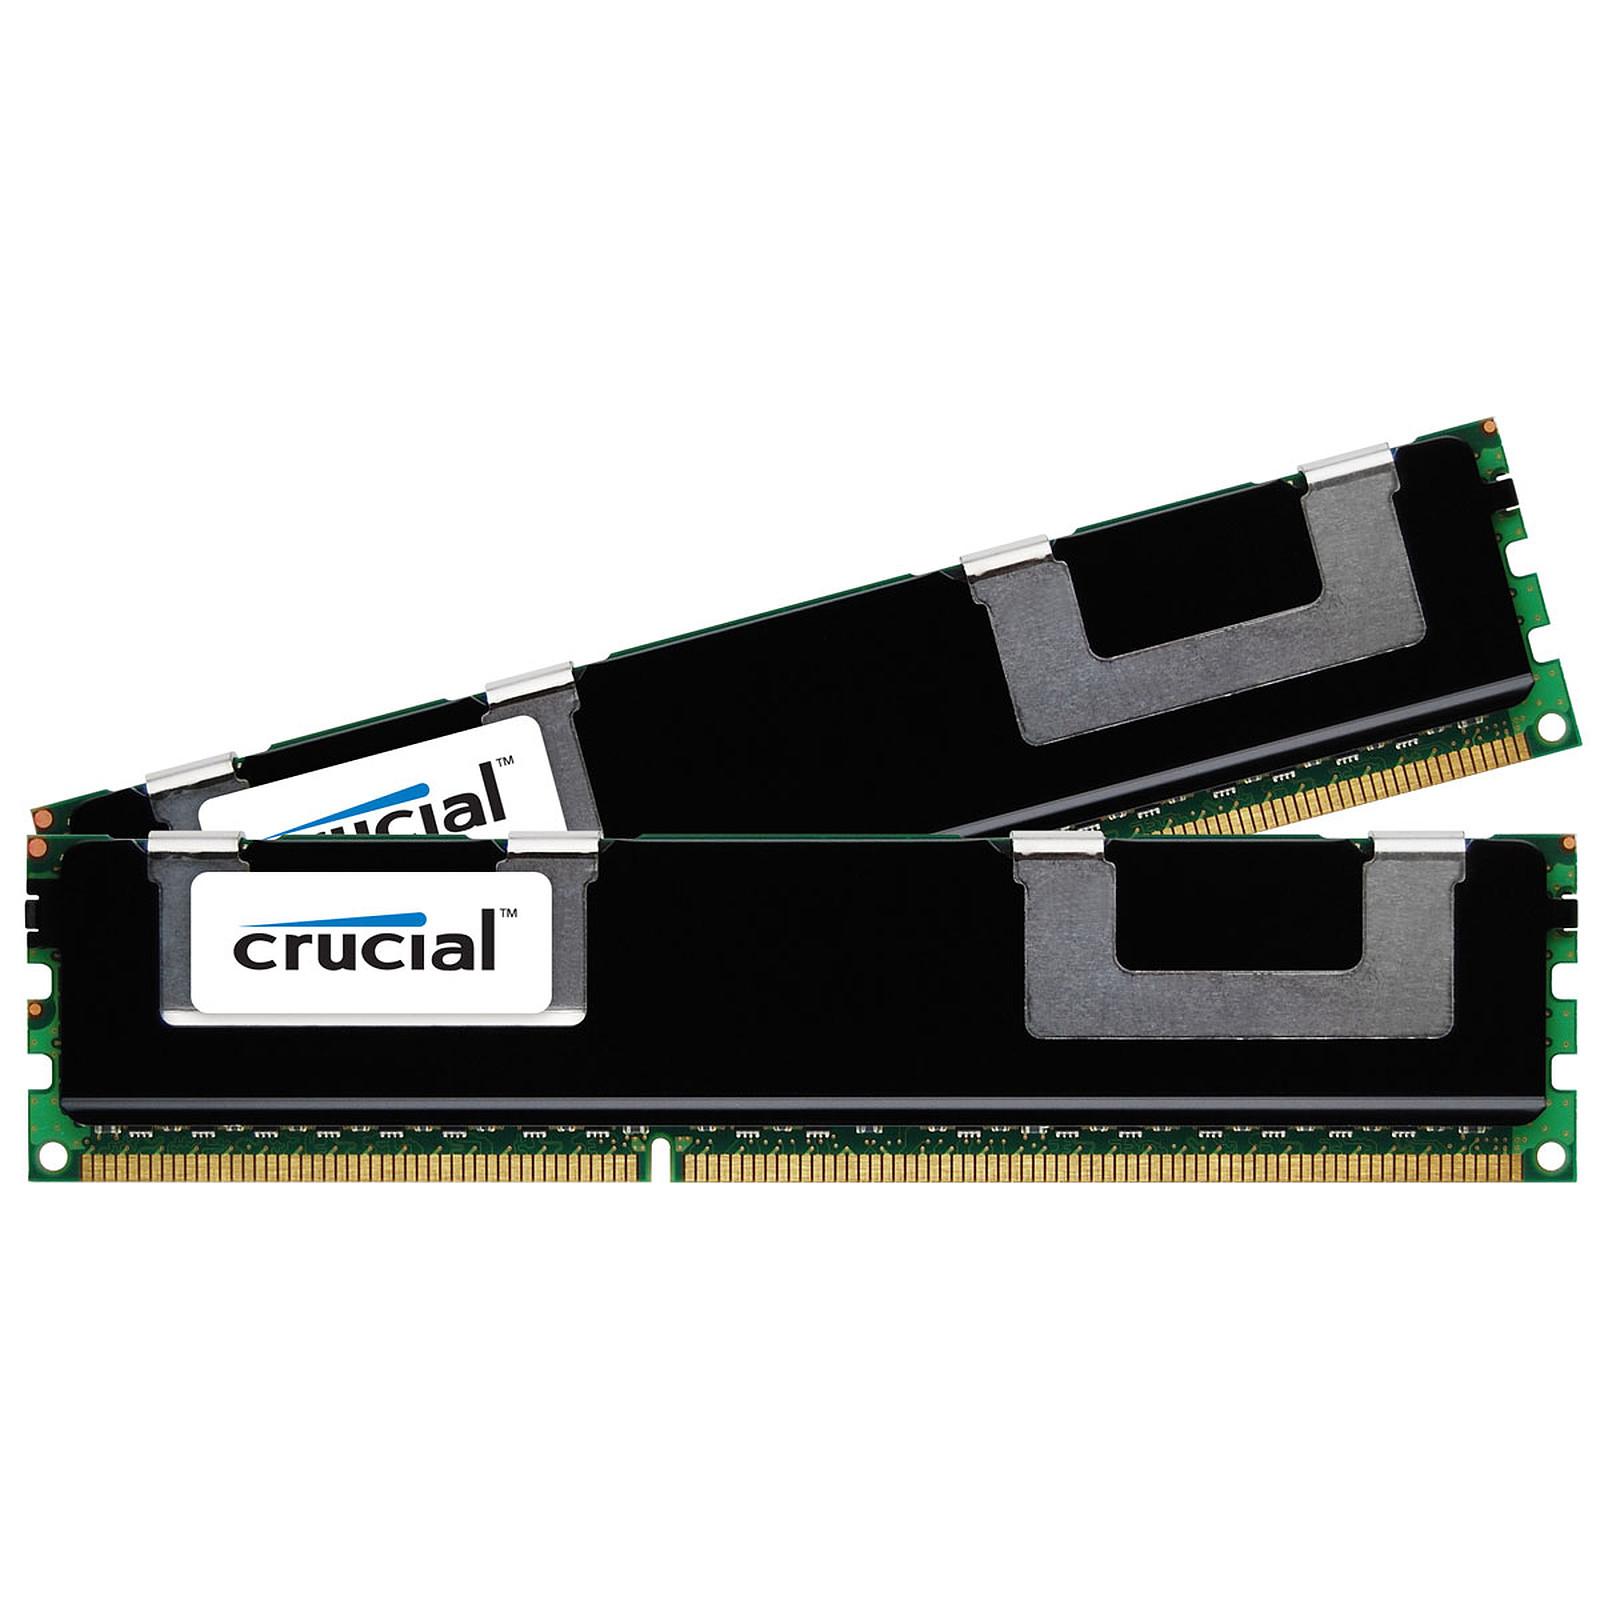 Crucial 16 Go (2 x 8 Go) DDR3 1600 MHz CL11 ECC Registered DR